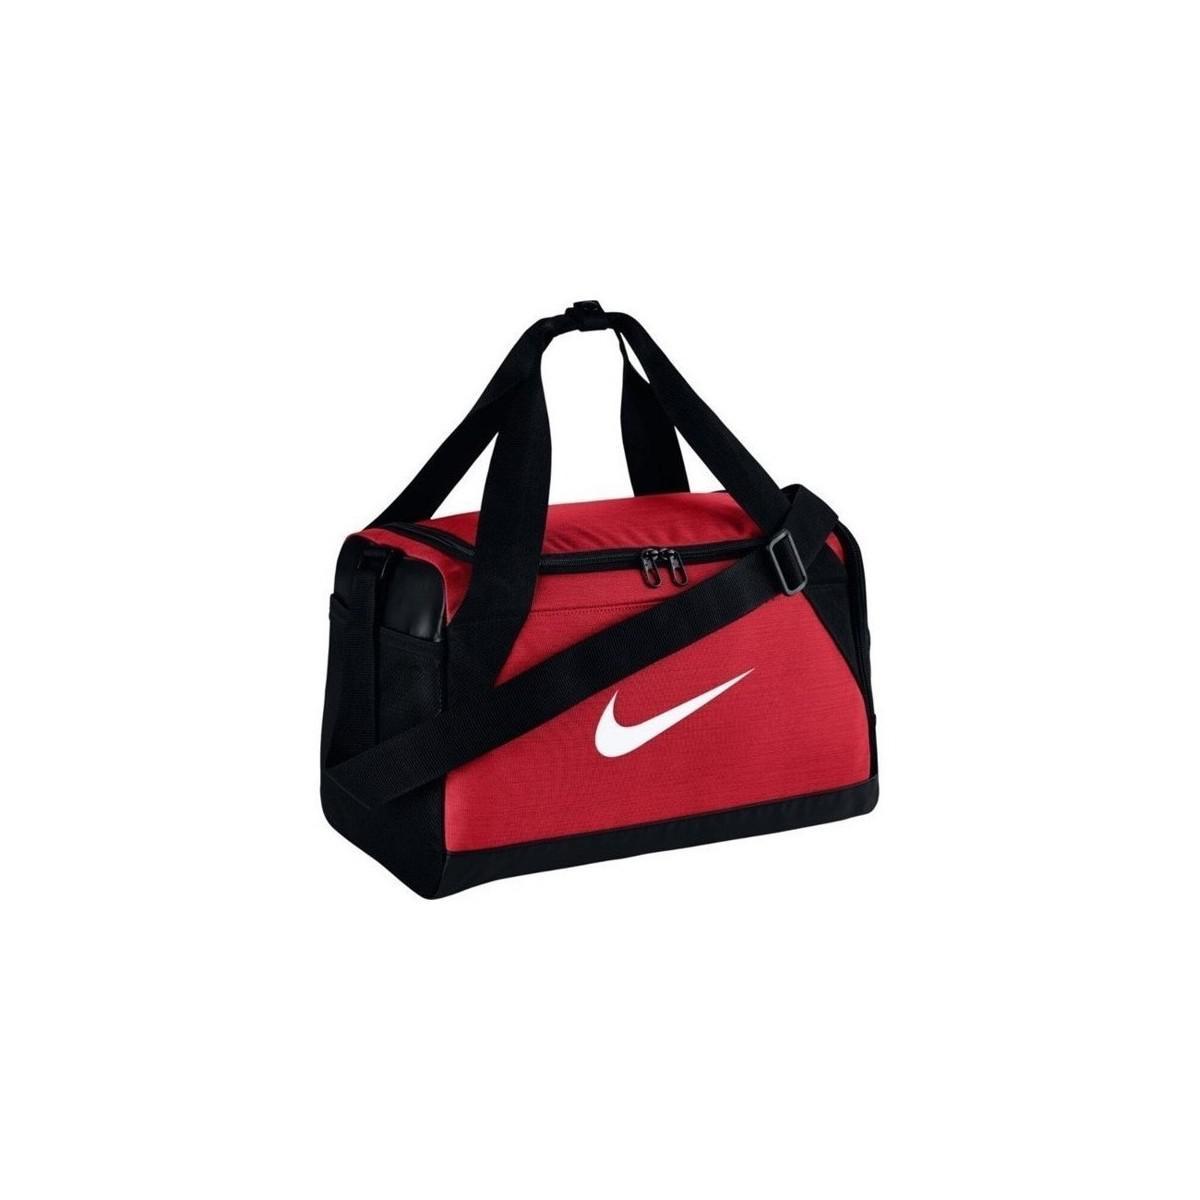 d27b3df30cf6 Nike Brasilia 6 Xs Duffel Gym Bag